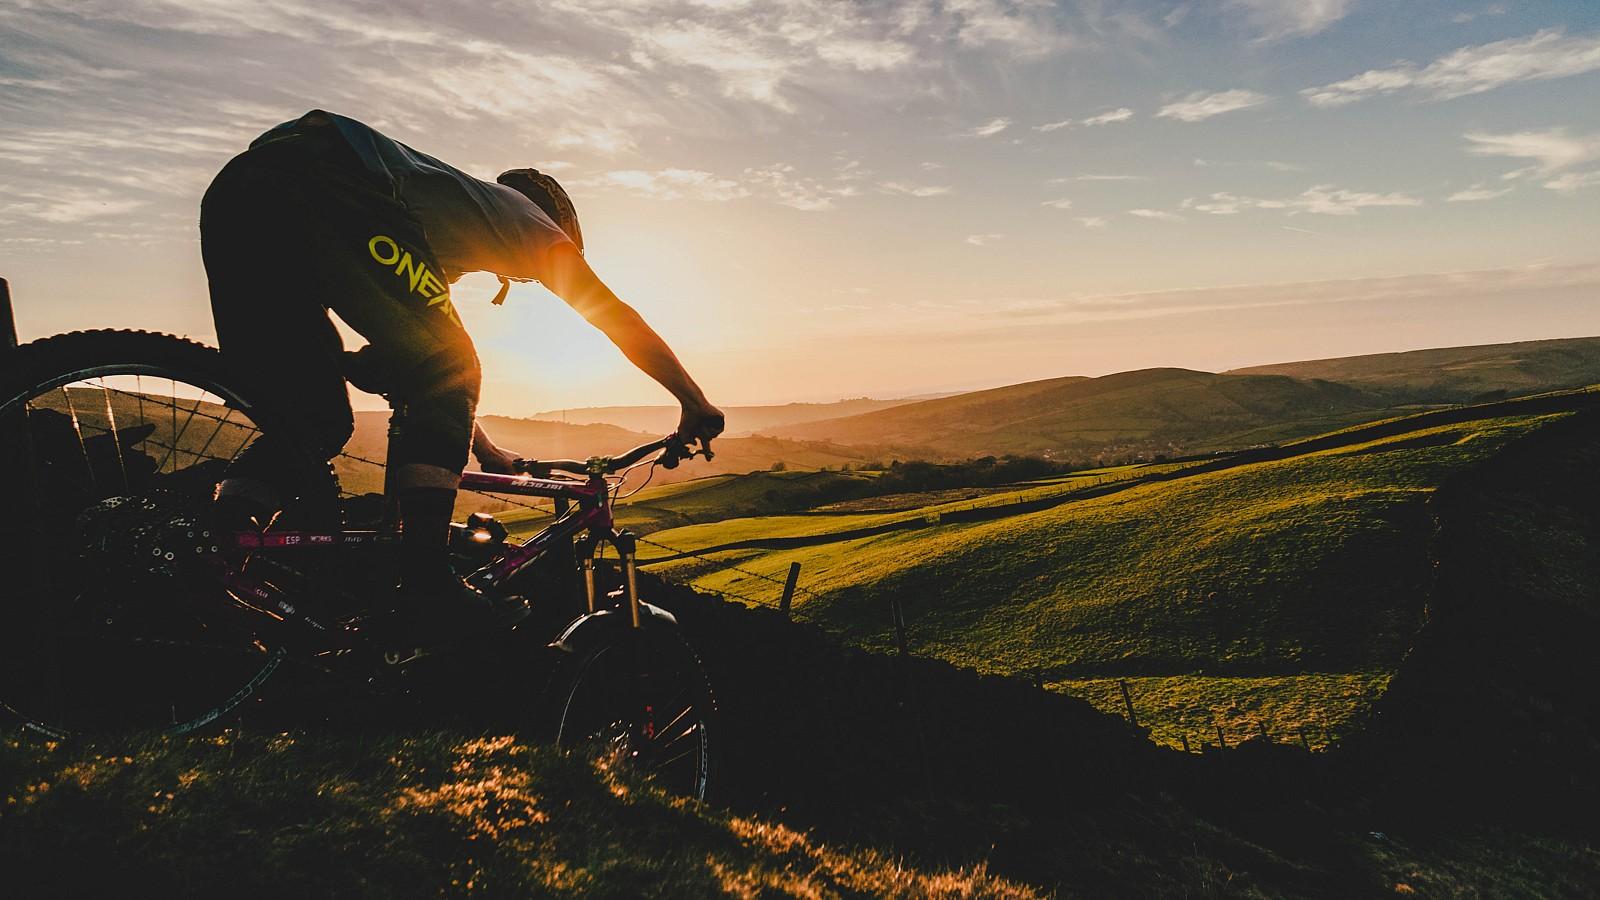 Golden Hour - Mushrum - Mountain Biking Pictures - Vital MTB